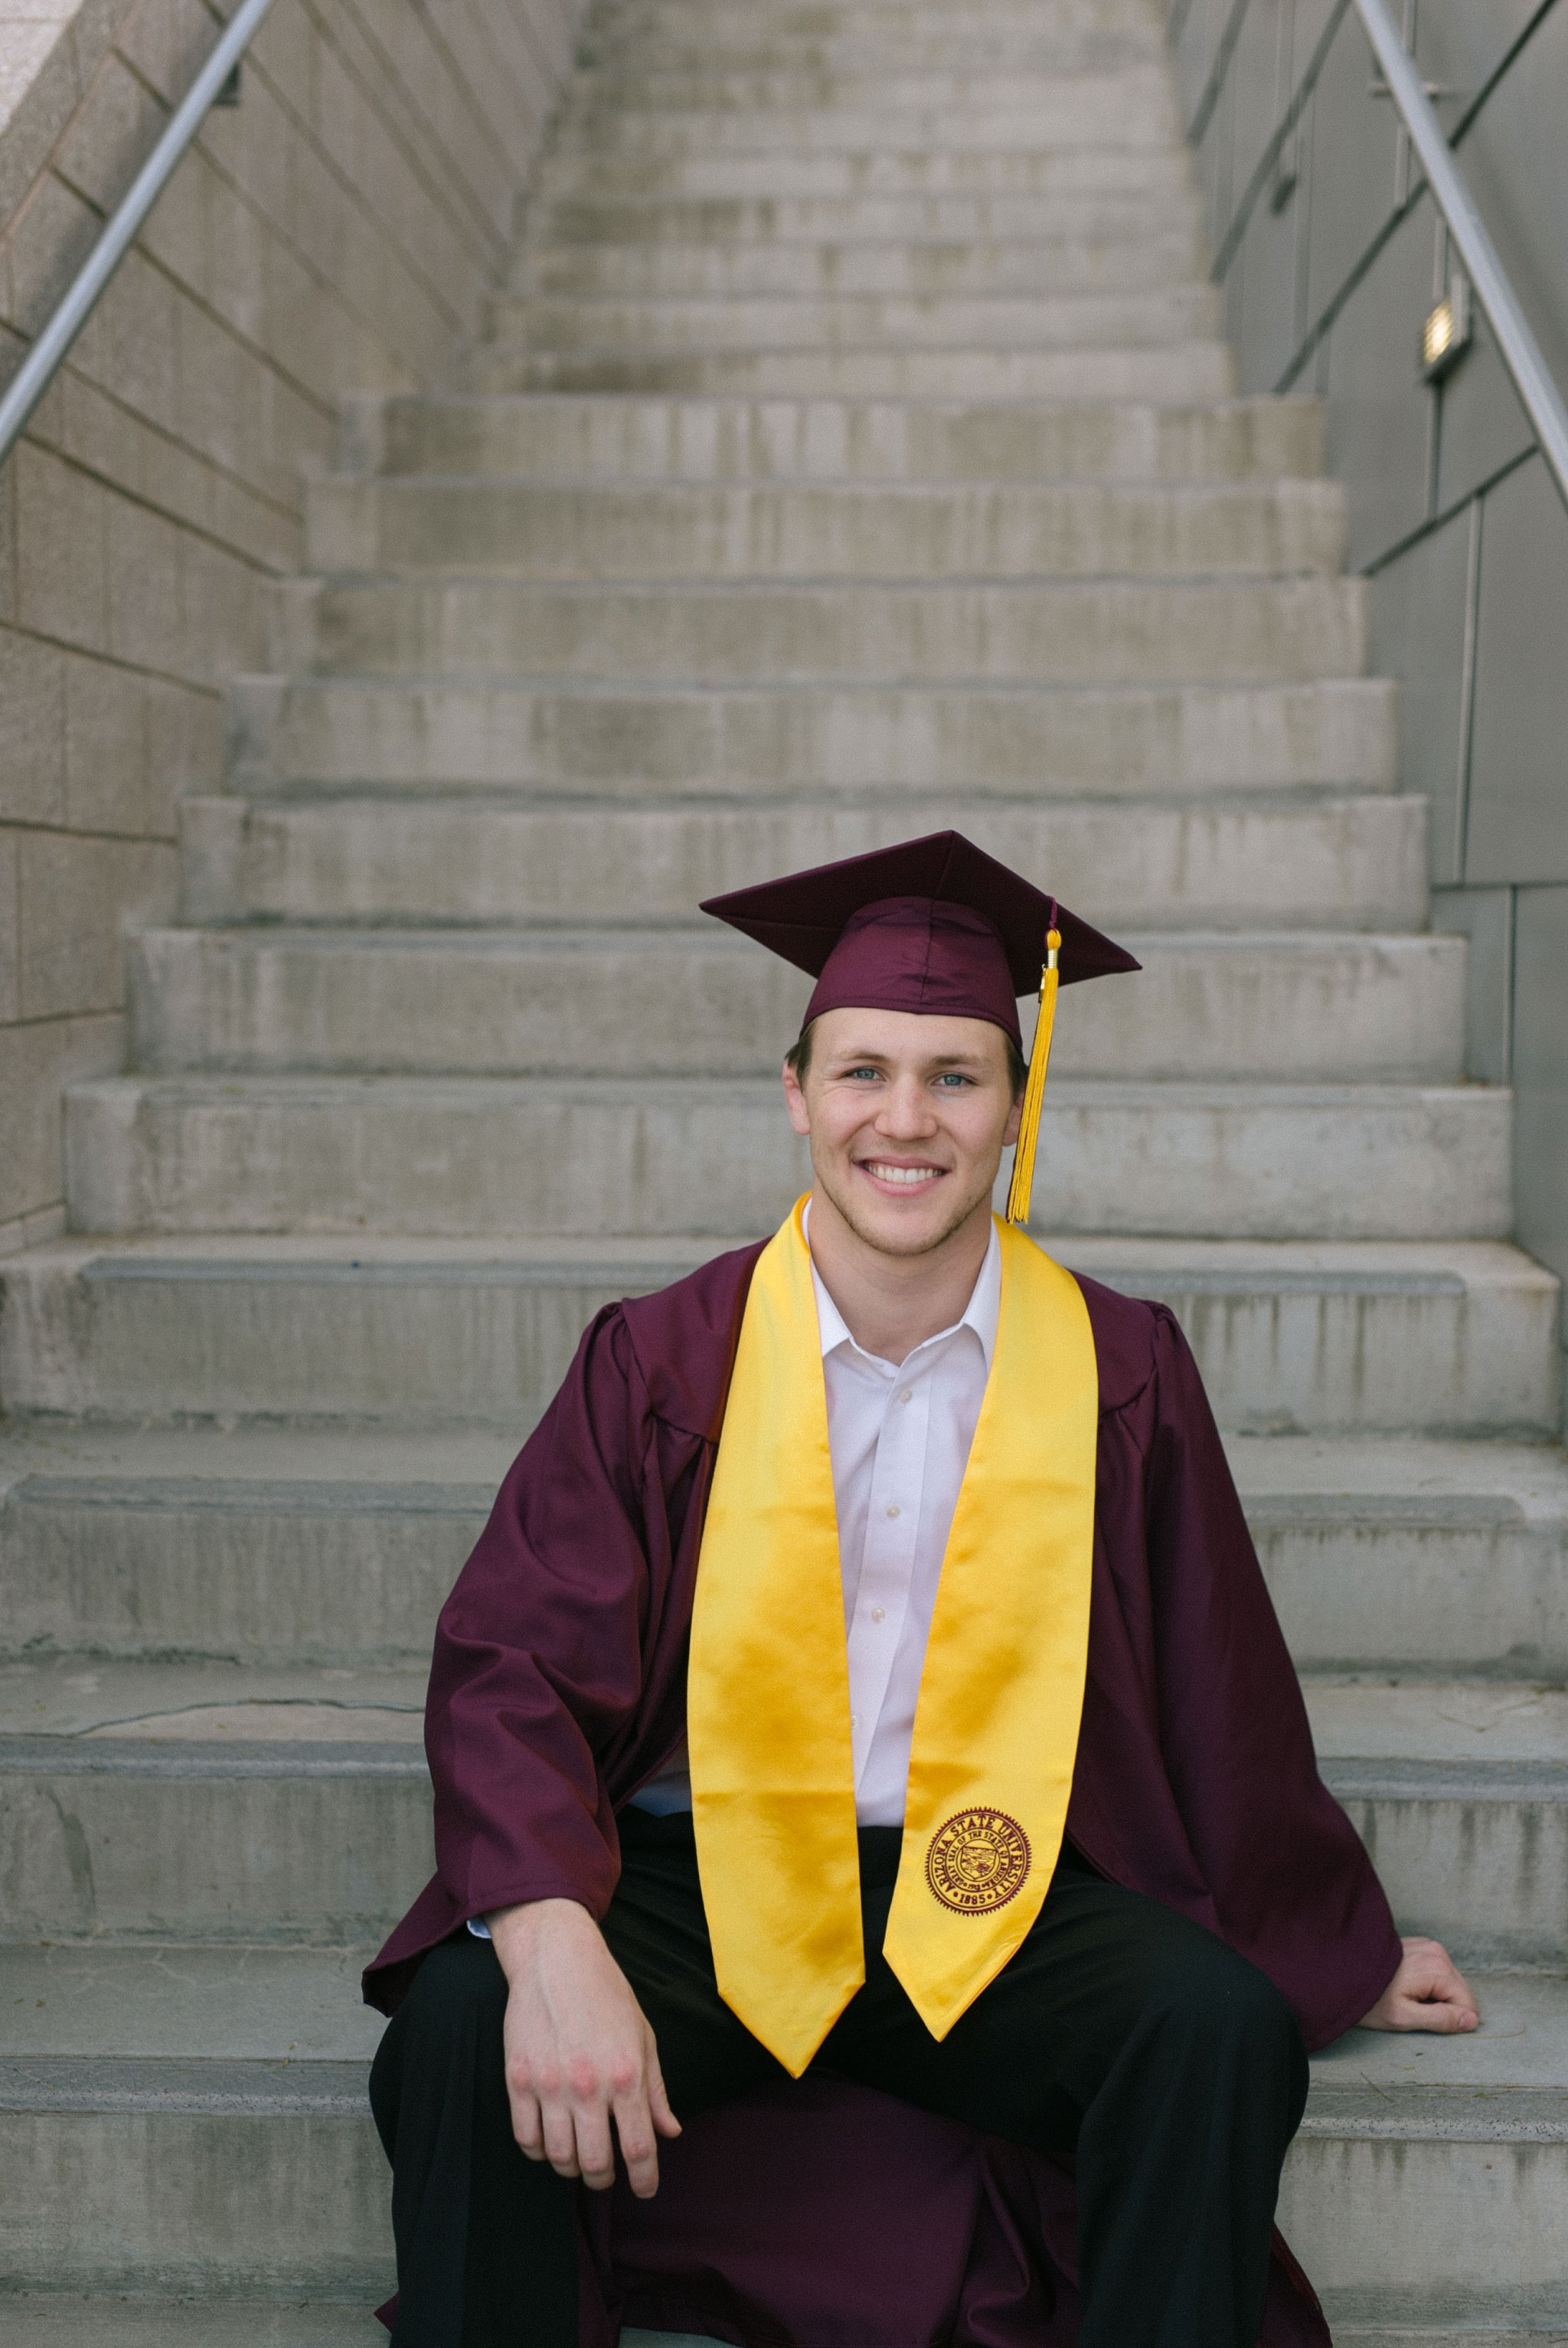 Arizona State University college senior guy